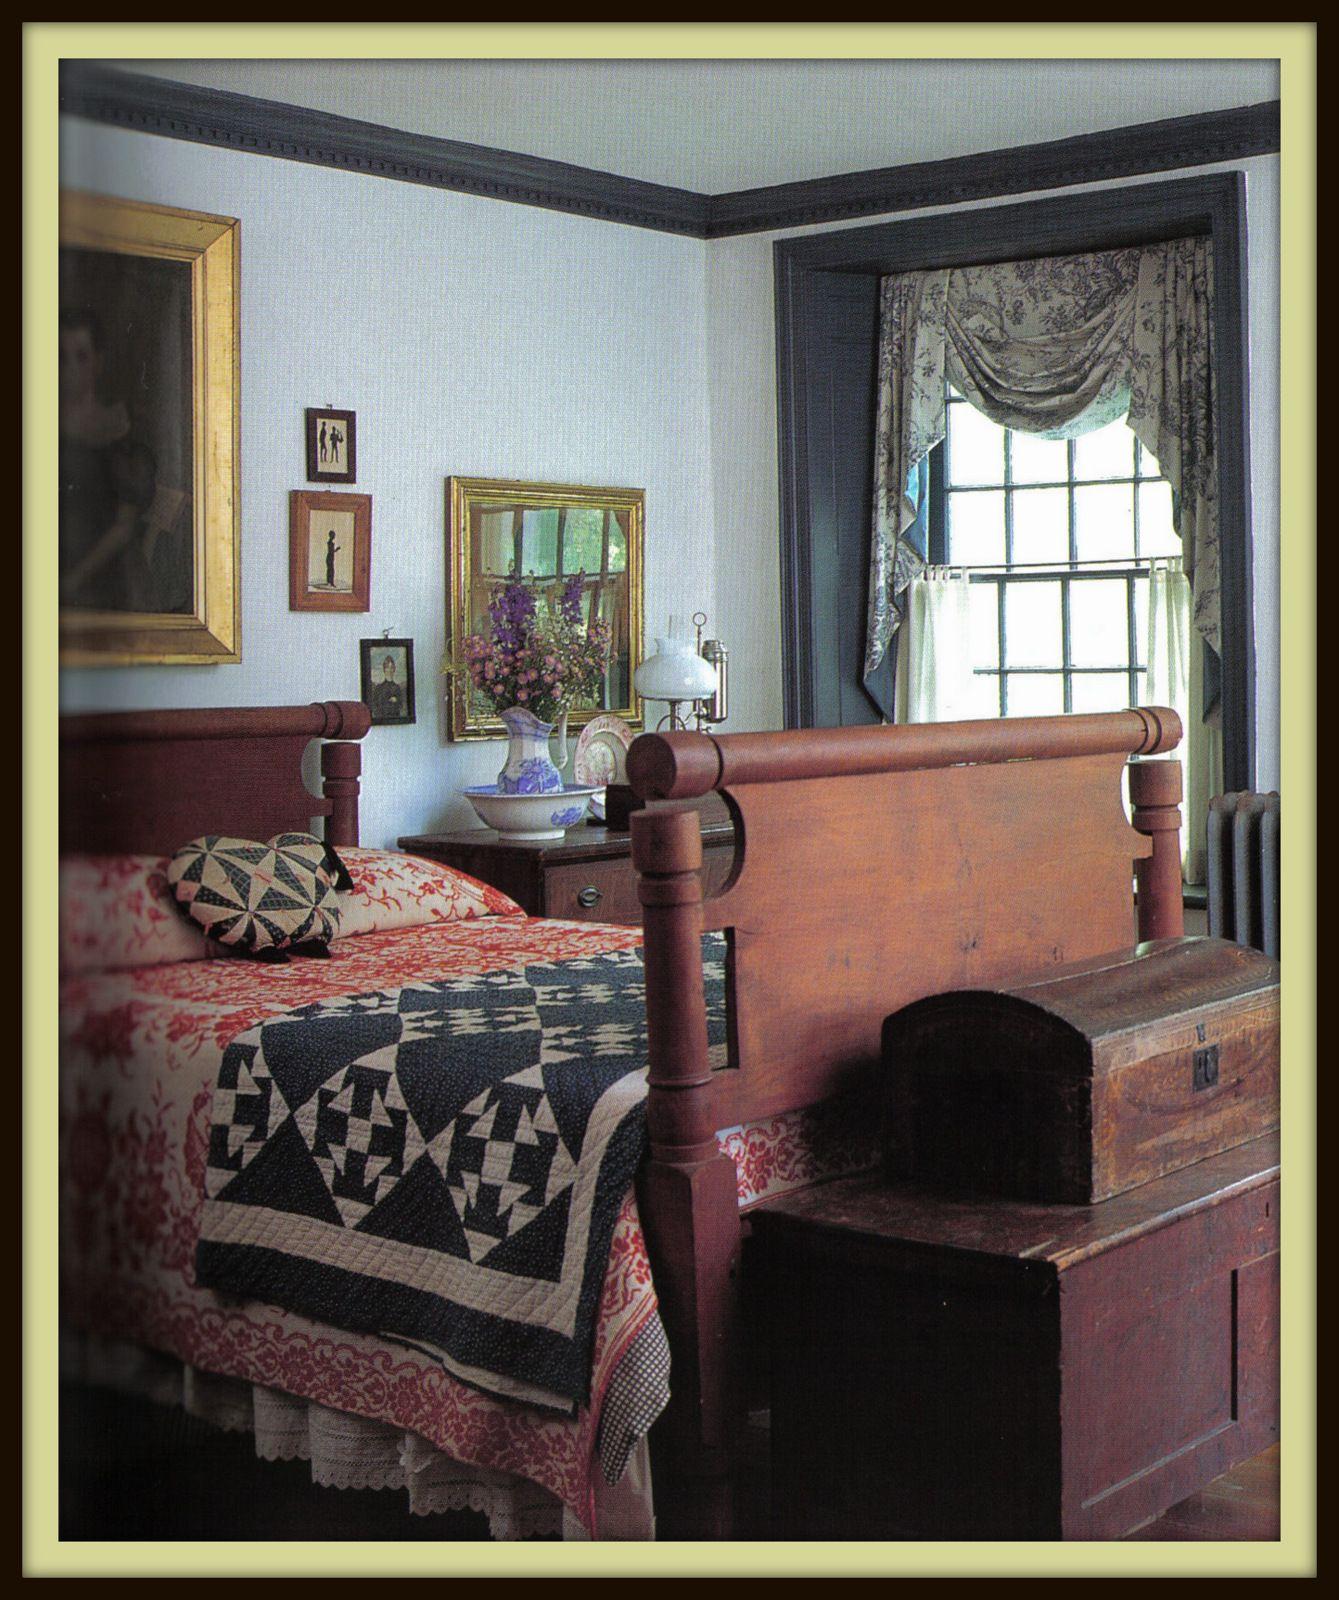 Decorating Colonial/Primitive Bedrooms